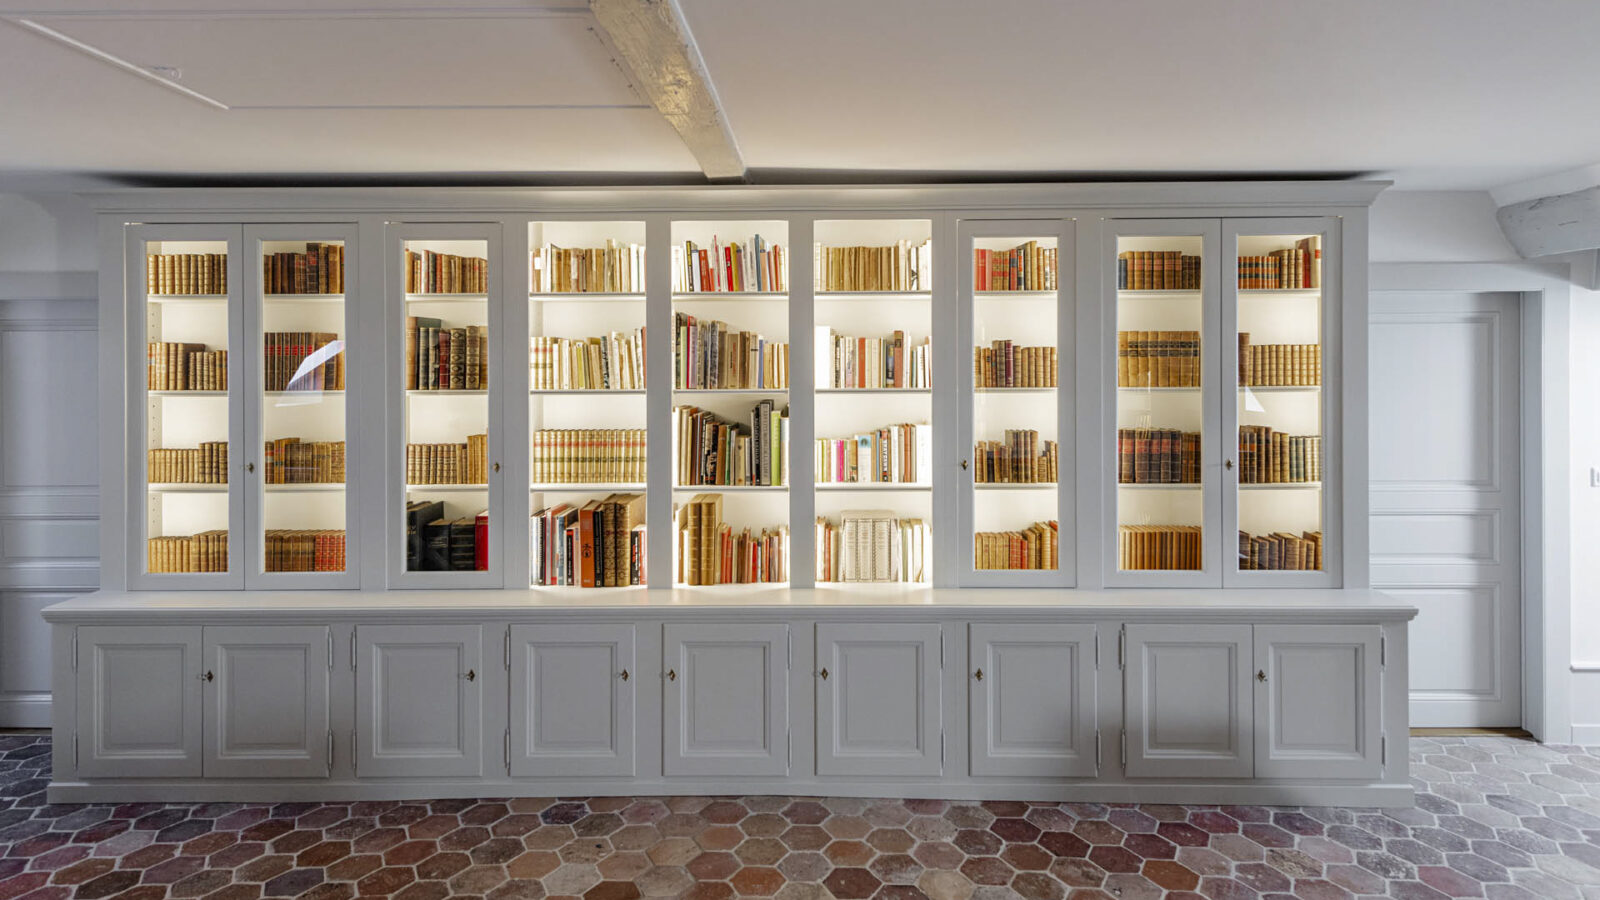 CSDK Architectes Bibliothe%CC%80que Cre%CC%81ation 1600x900 - Custom-made bookcase - Geneva - CSDK Architectes Bibliothe%CC%80que Cre%CC%81ation 1600x900